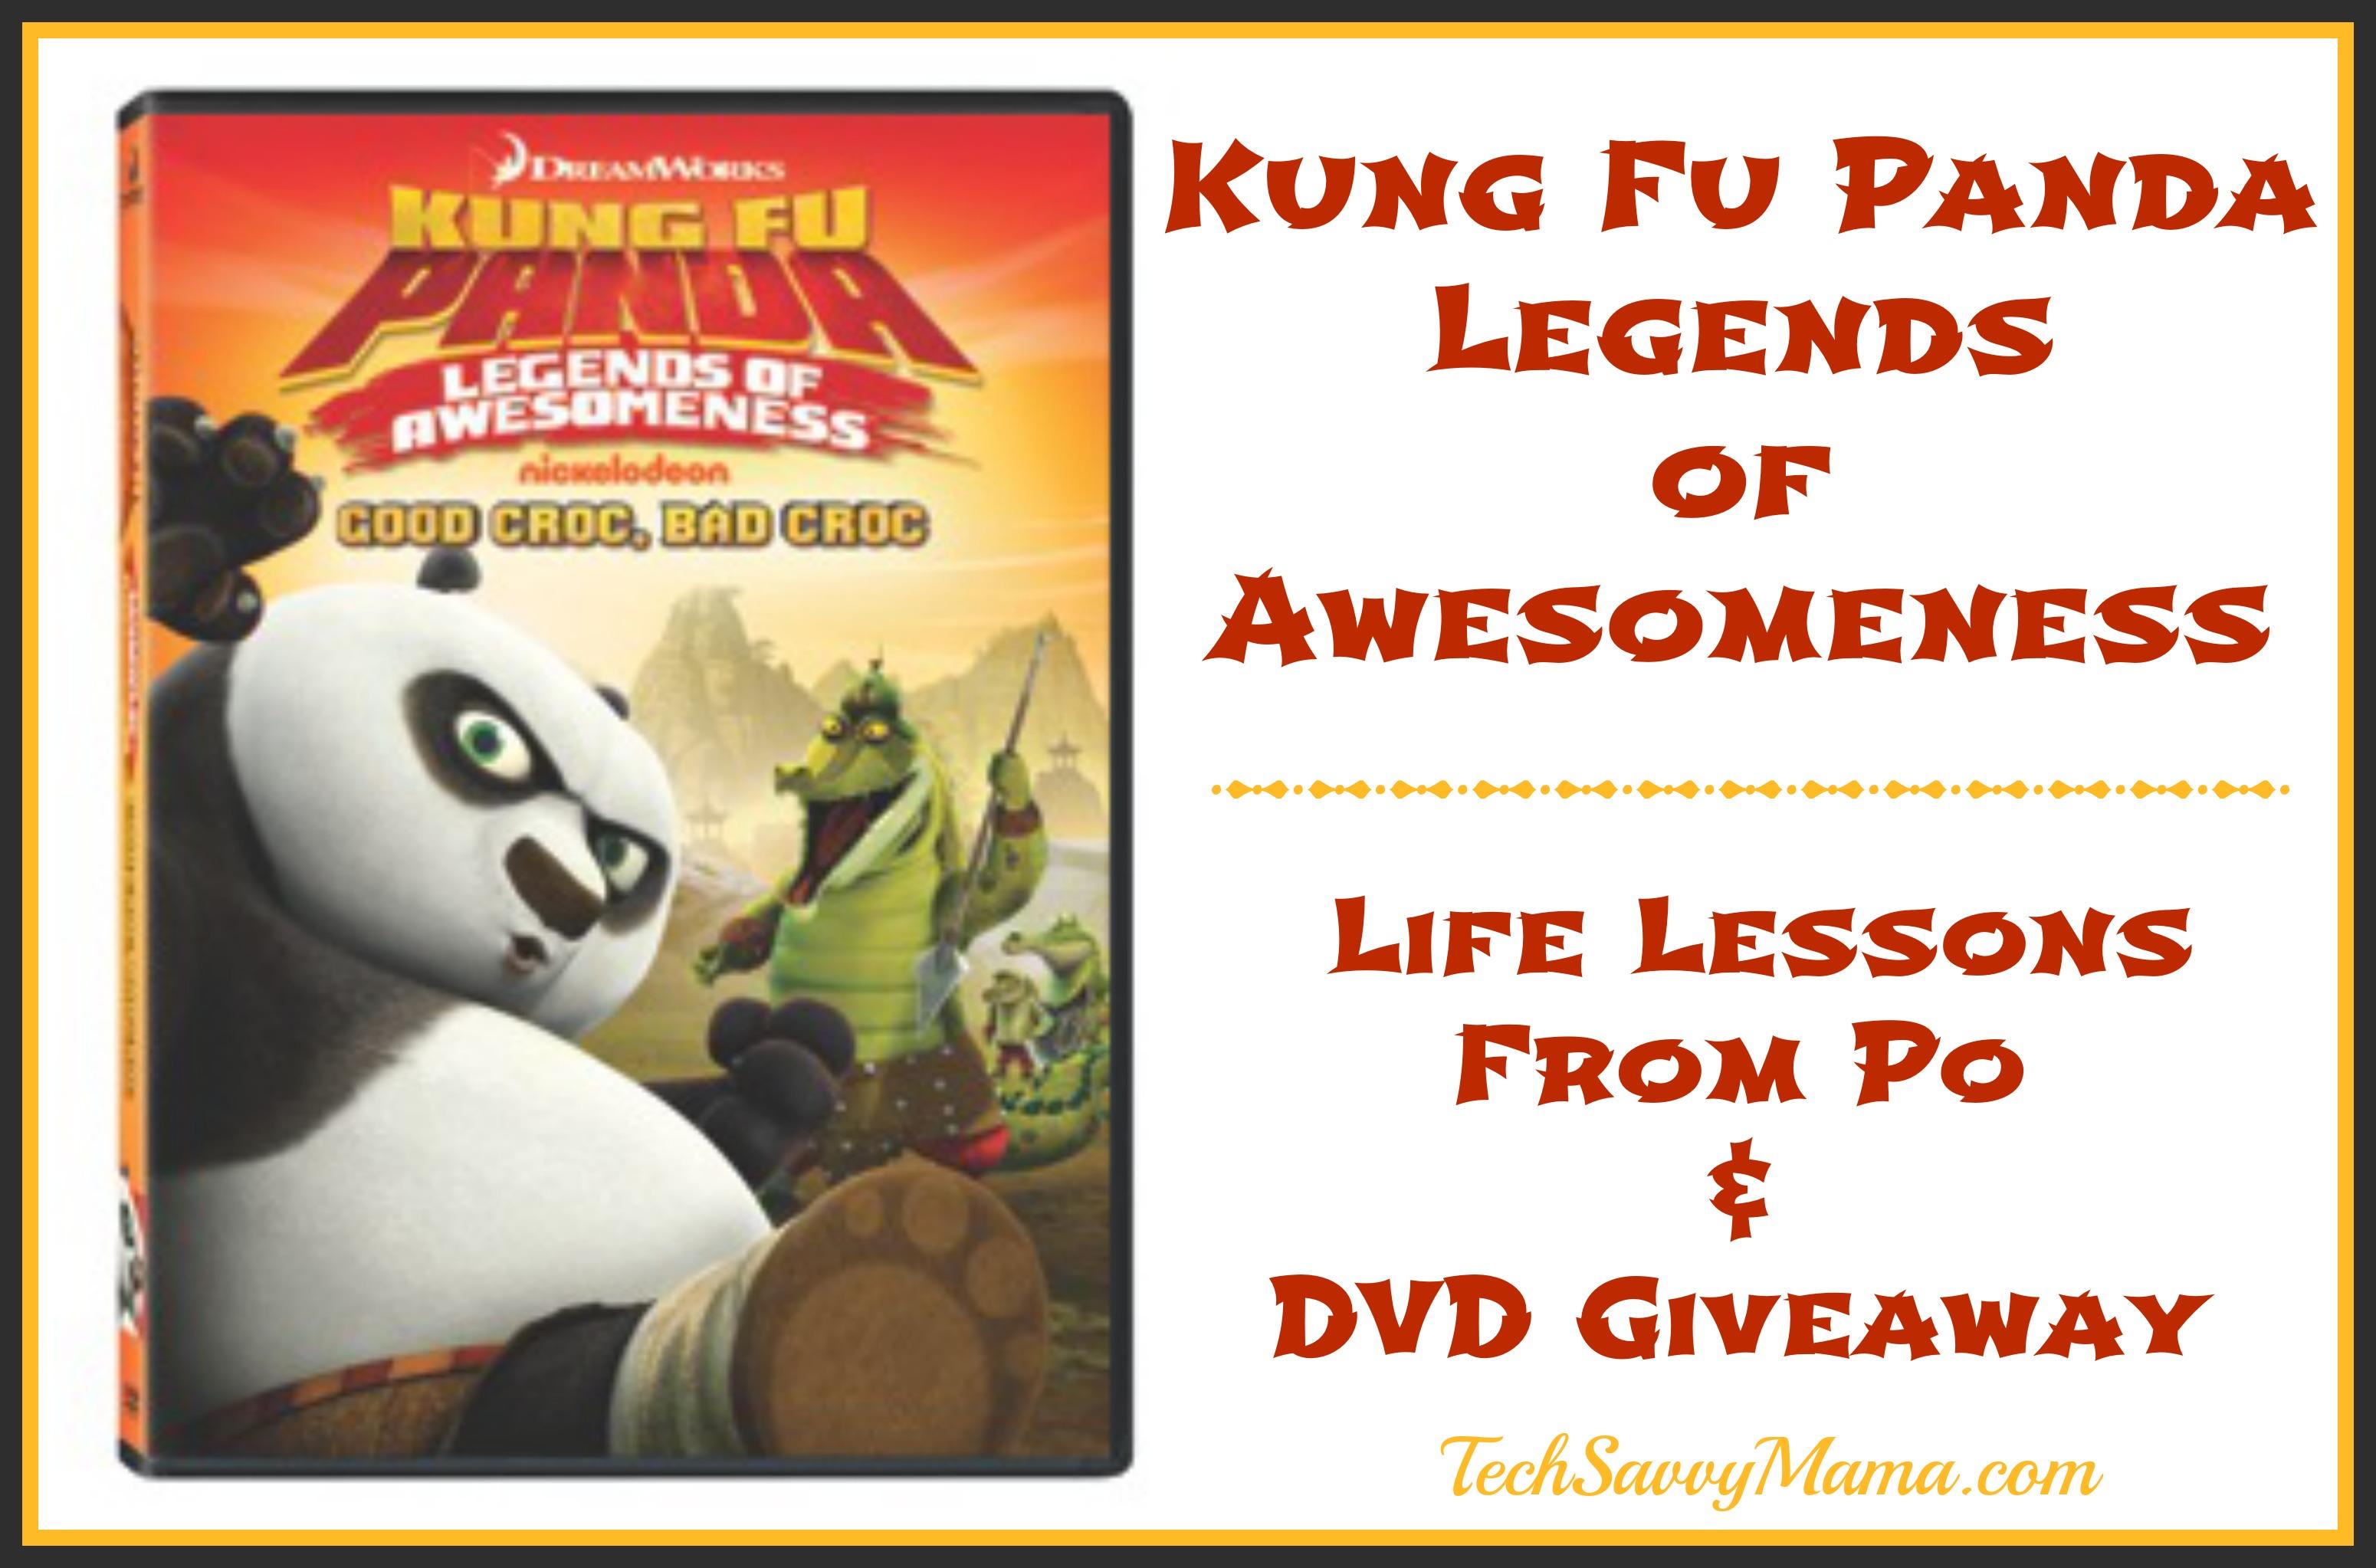 Childrens DVD Review: Kung Fu Panda: Legends of